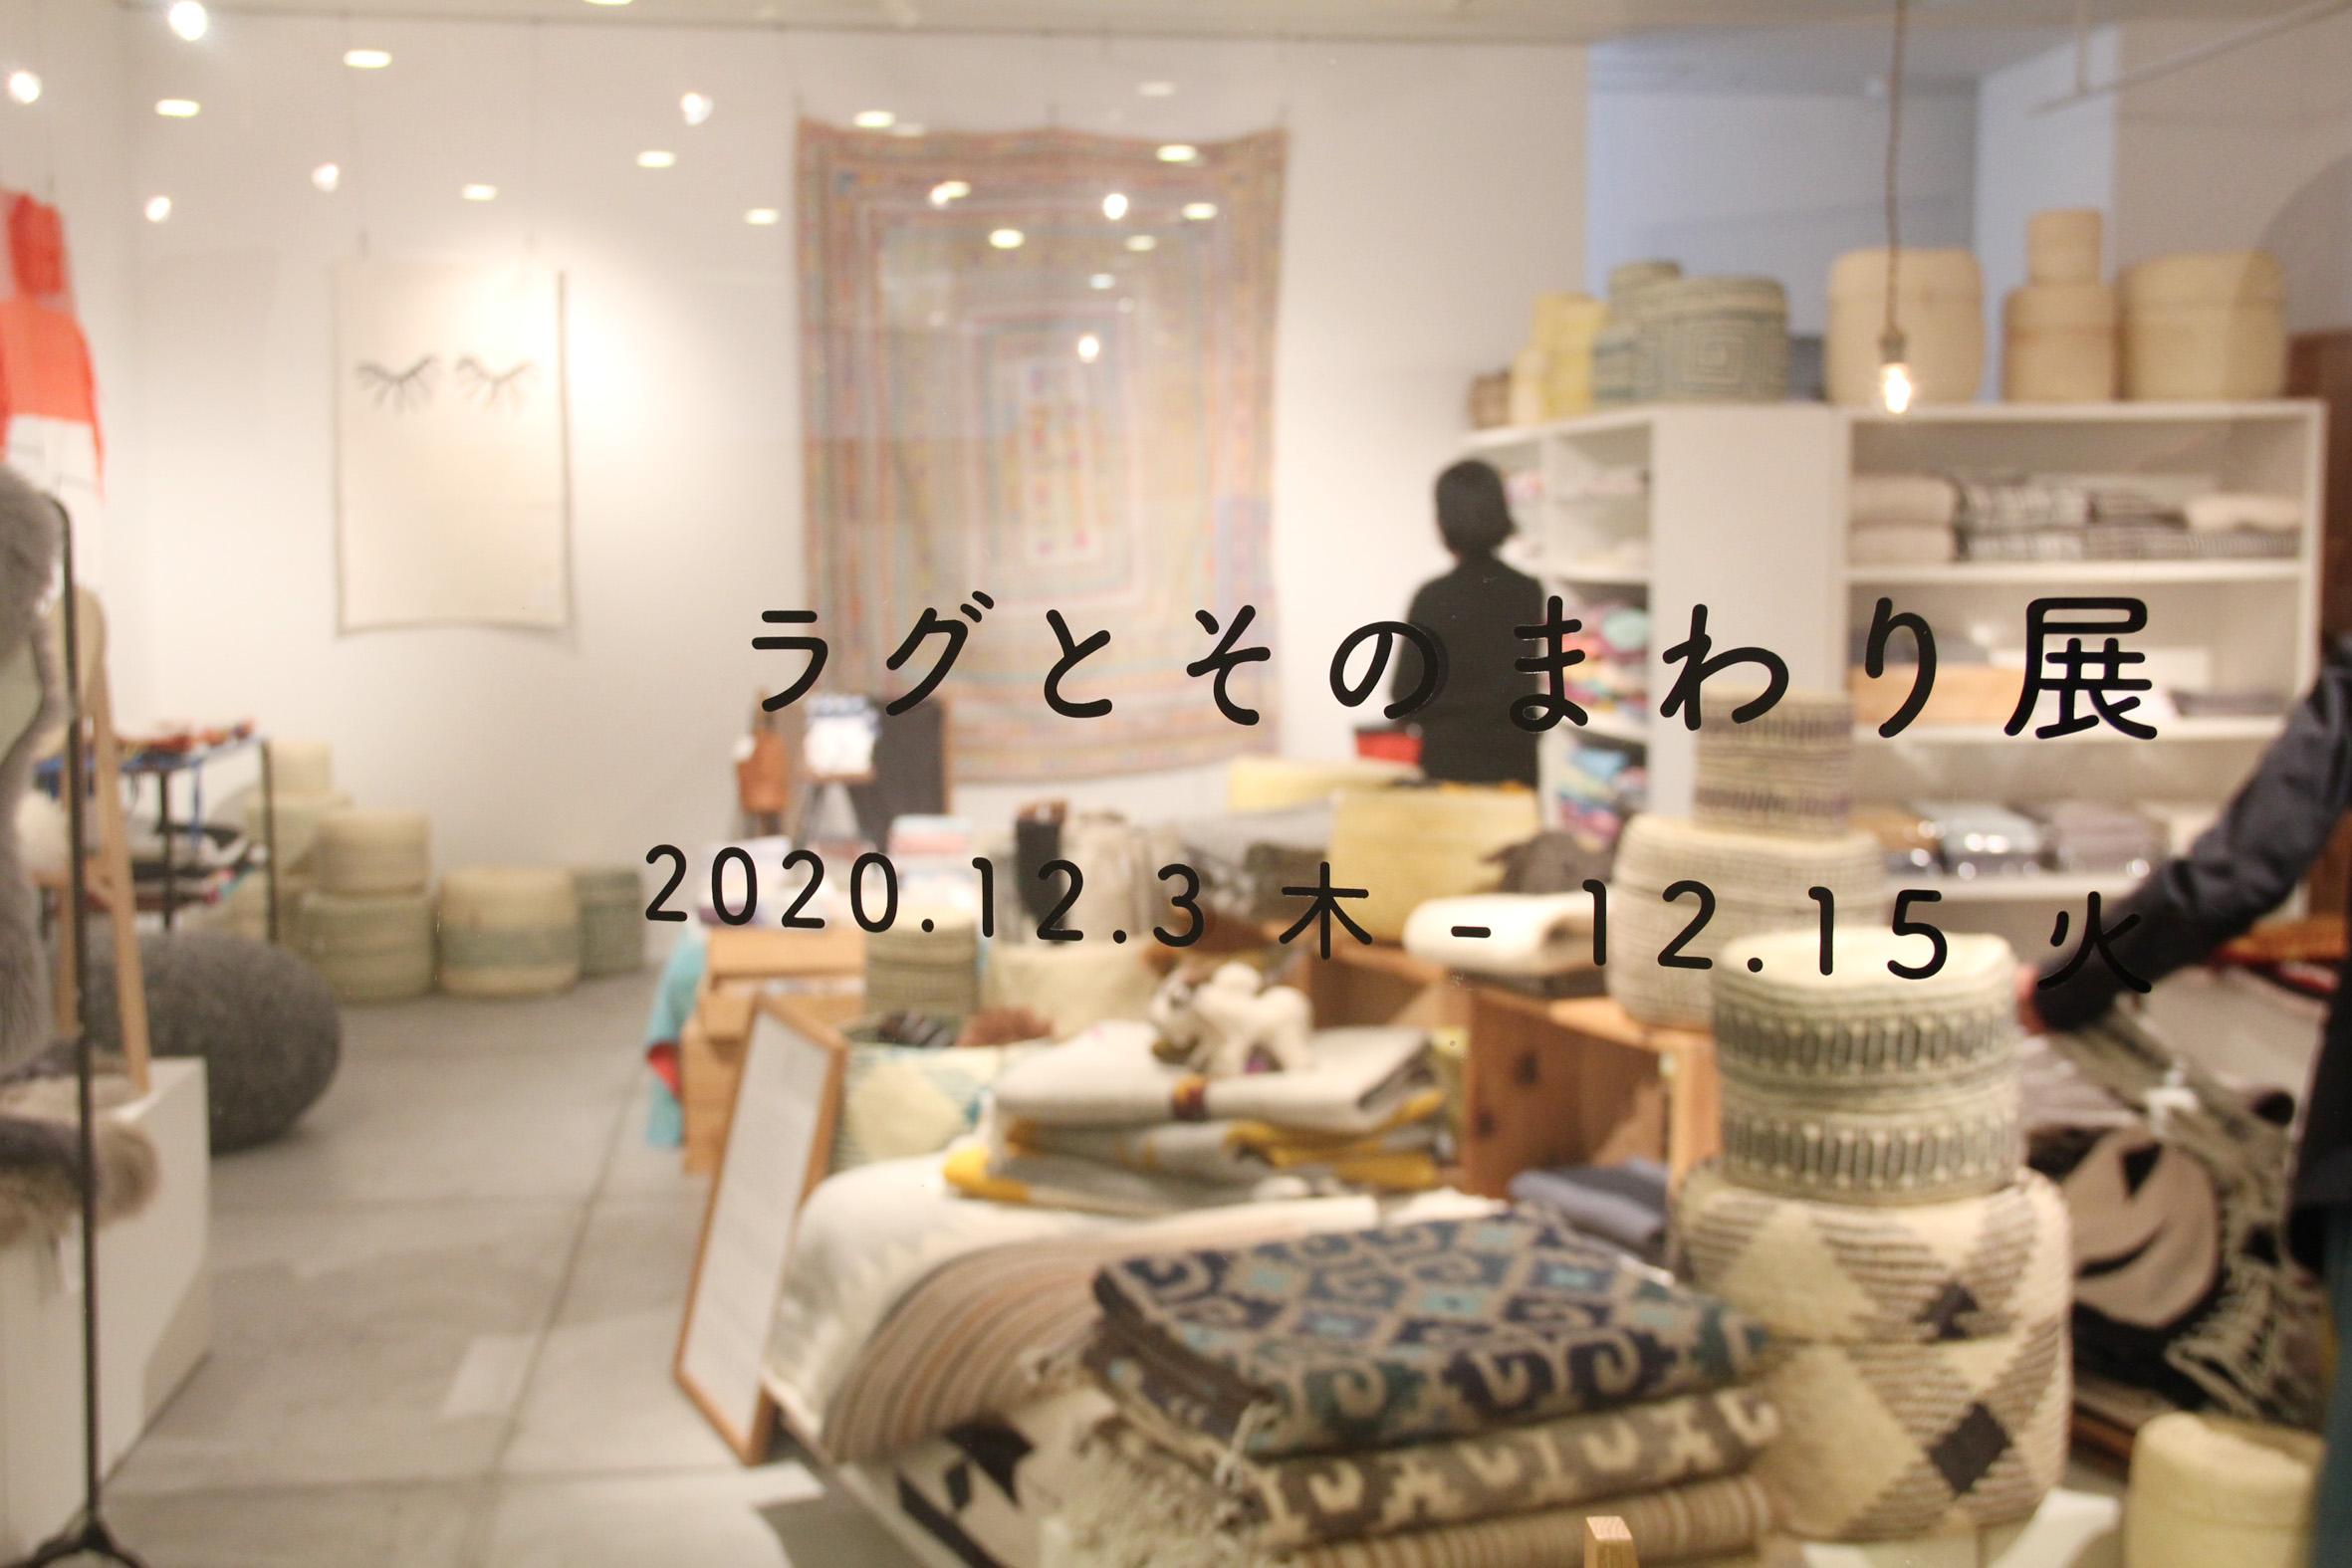 https://www.schule.jp/hibinokoto/lag16.jpg